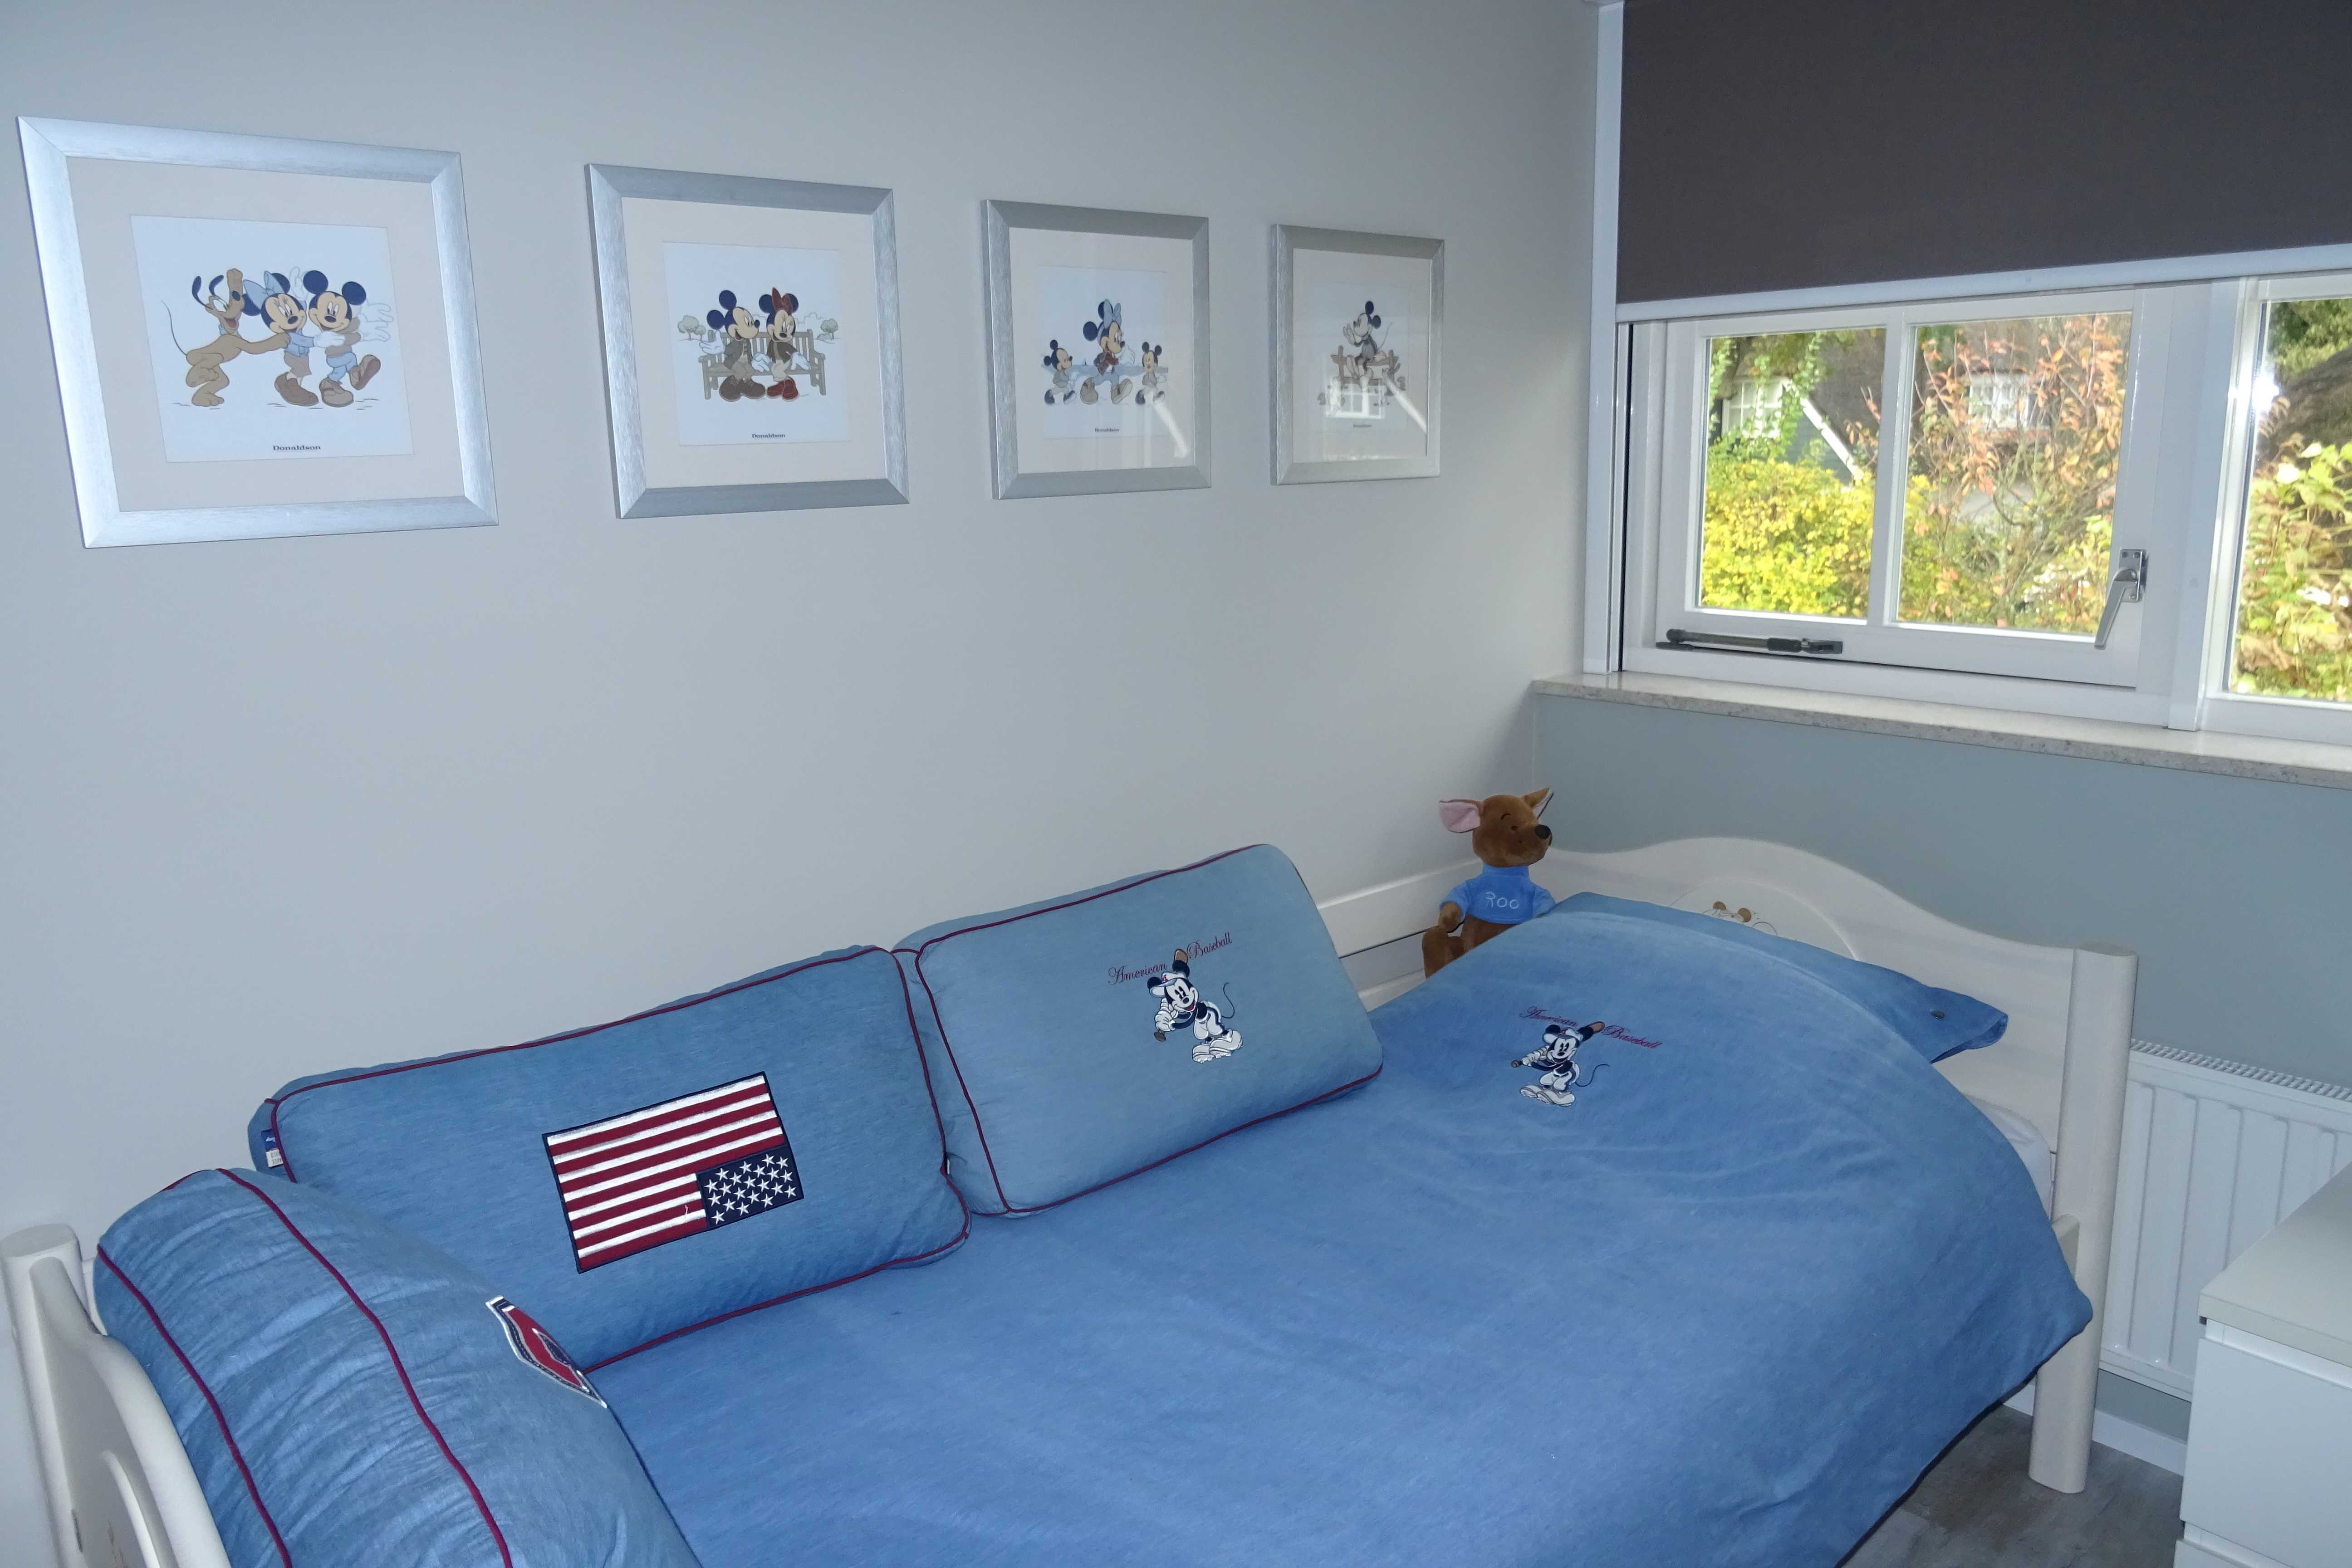 kinderslaapkamer-villa-burghduin